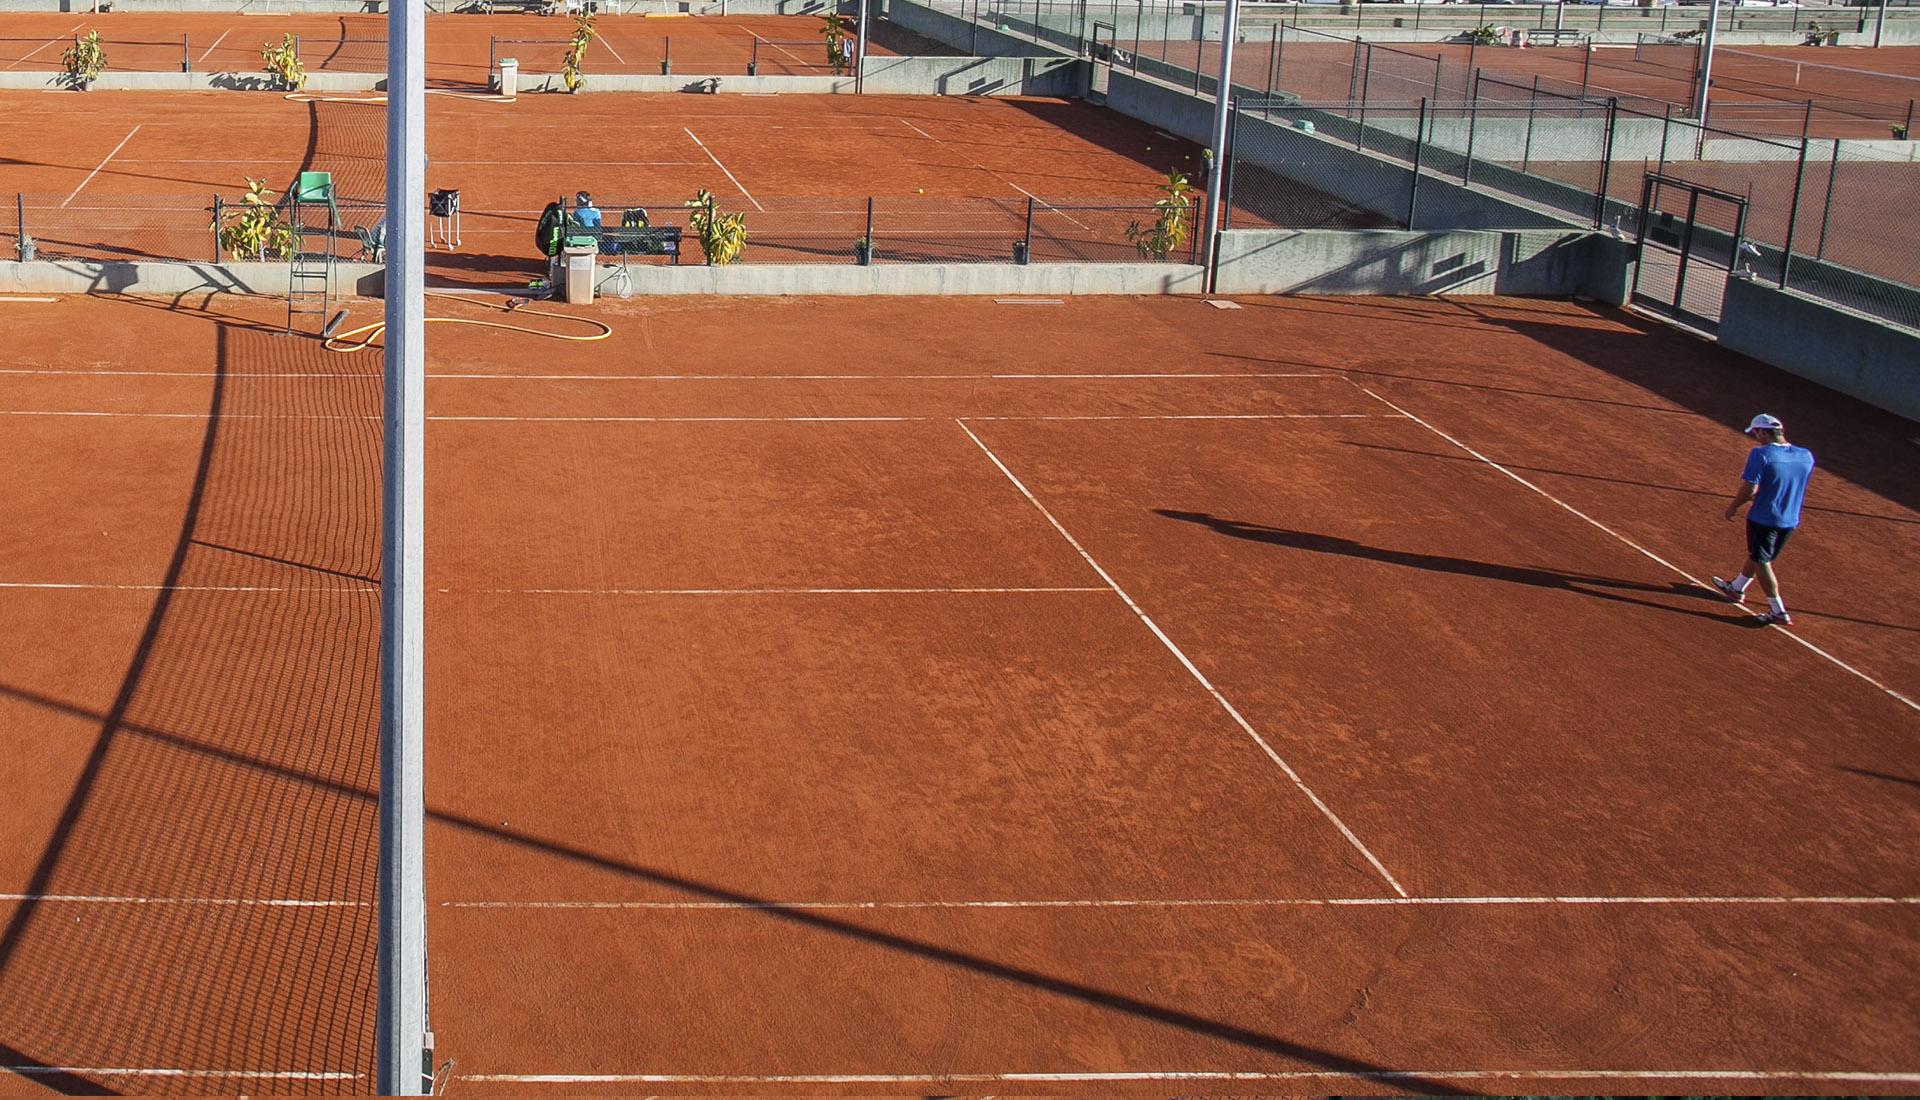 Tennis in Magaluf, tenis en mallorca , tennis in mallorca , tennis a Mallorca, play tennis in Majorca , Club de tenis en Magaluf